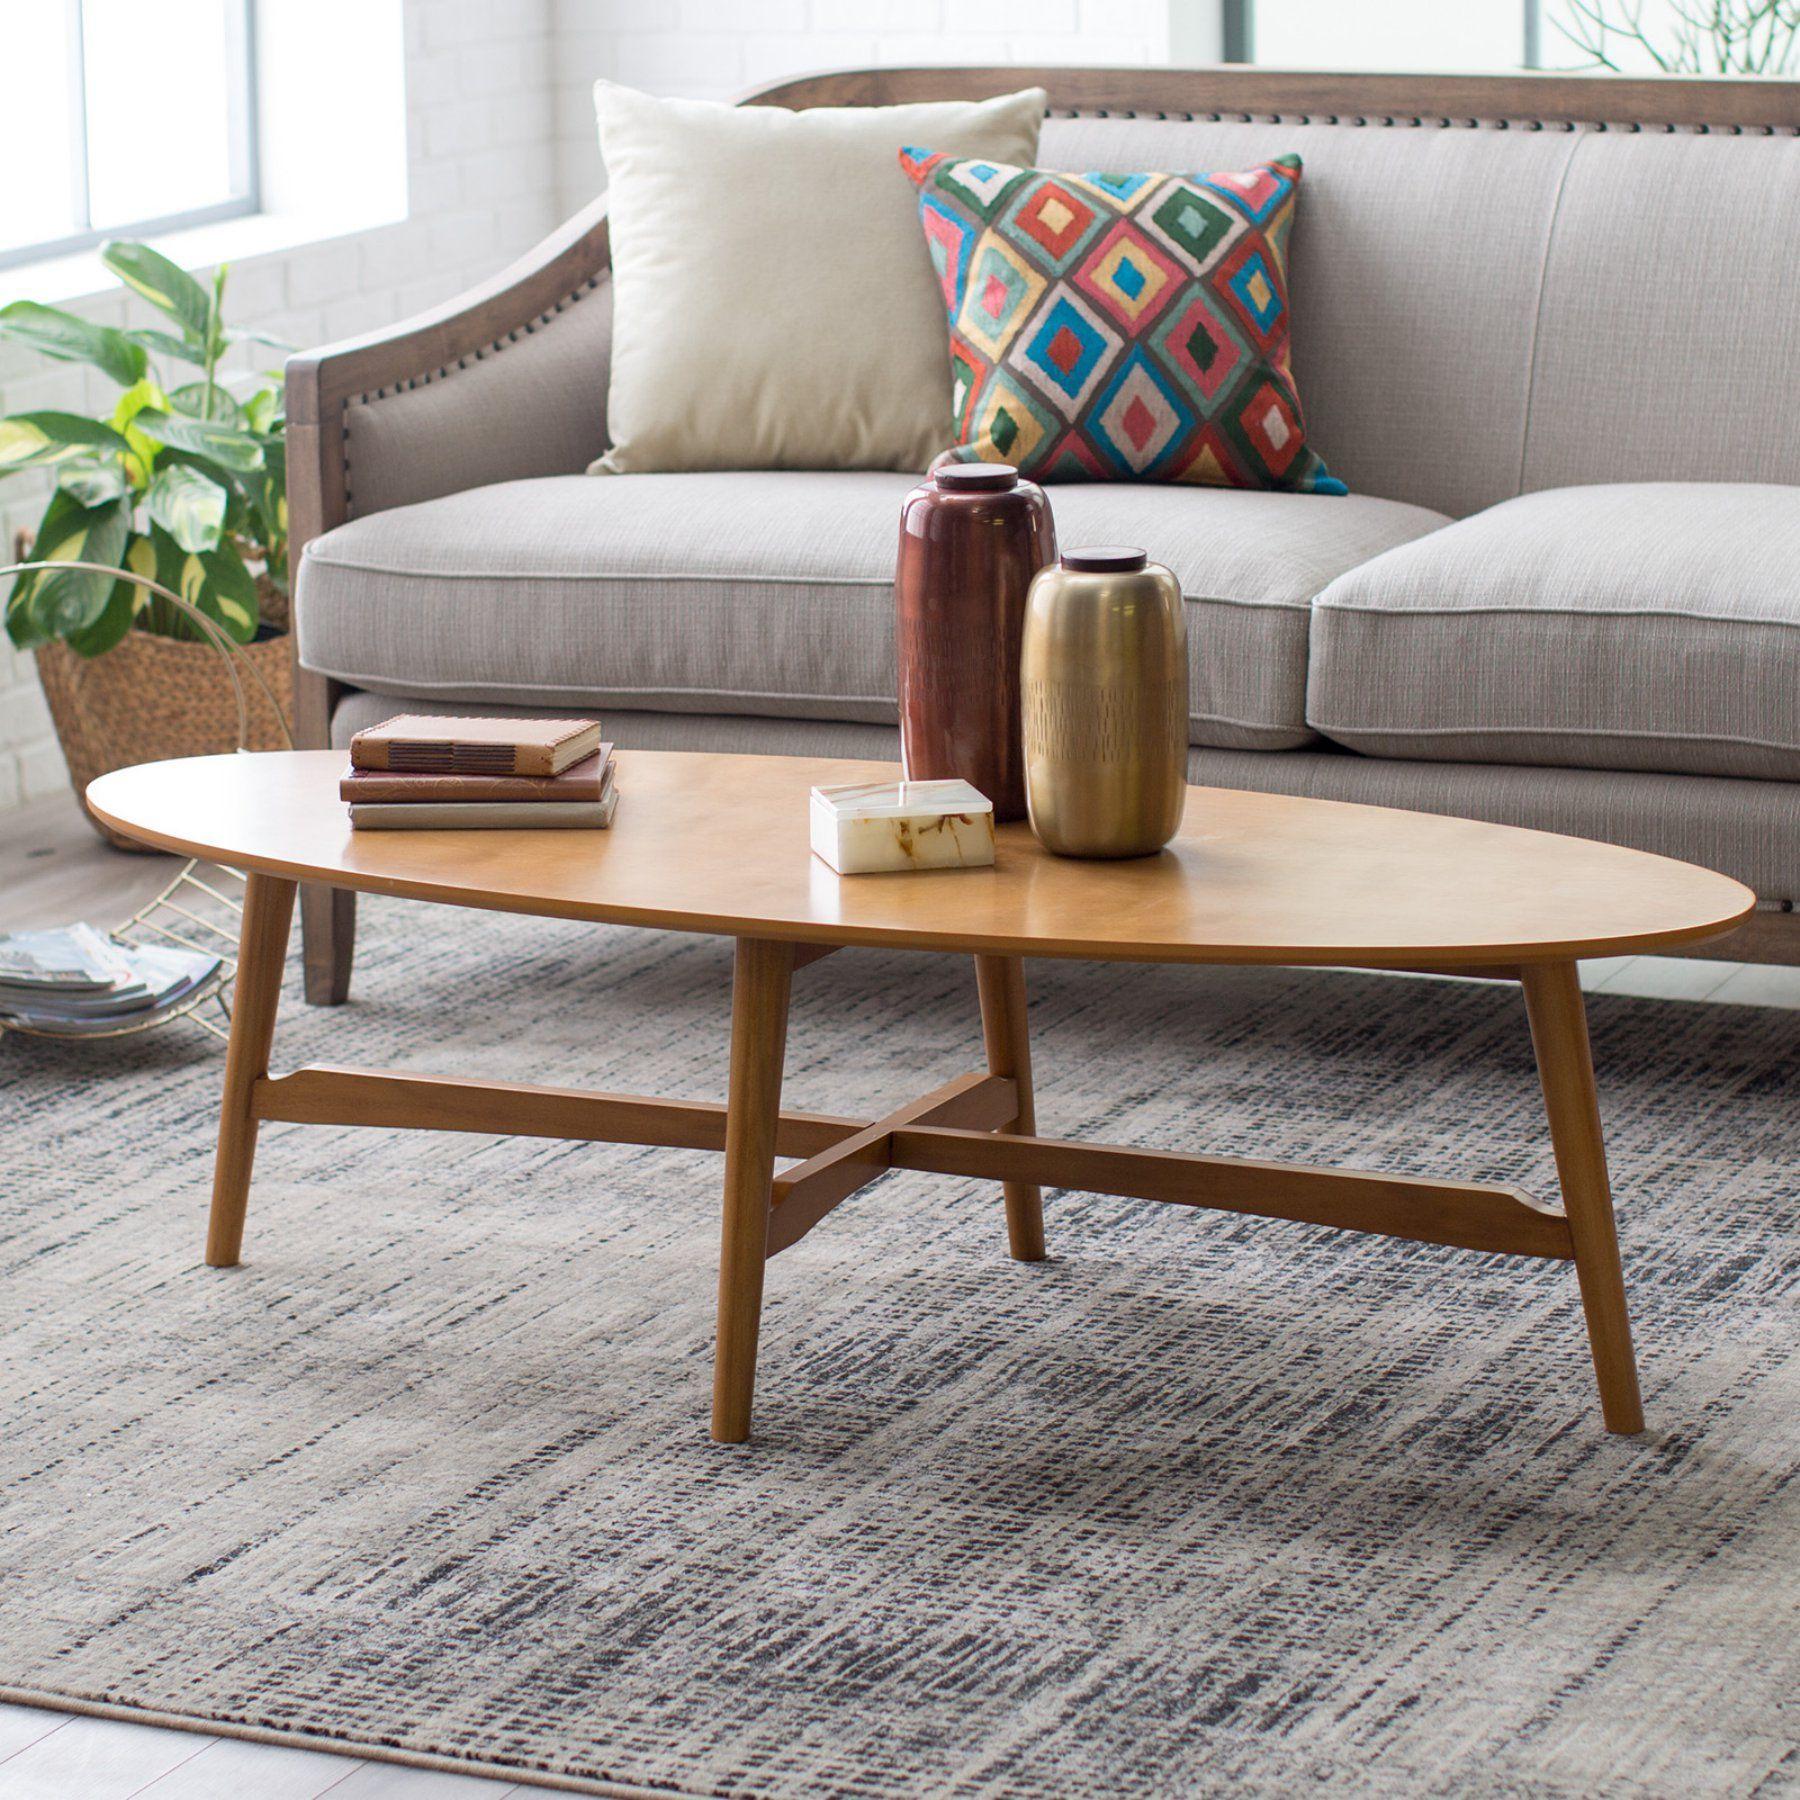 Belham Living Darby Mid Century Modern Coffee Table Pecan F Mid Century Modern Living Room Furniture Mid Century Modern Coffee Table Living Room Coffee Table [ 1800 x 1800 Pixel ]